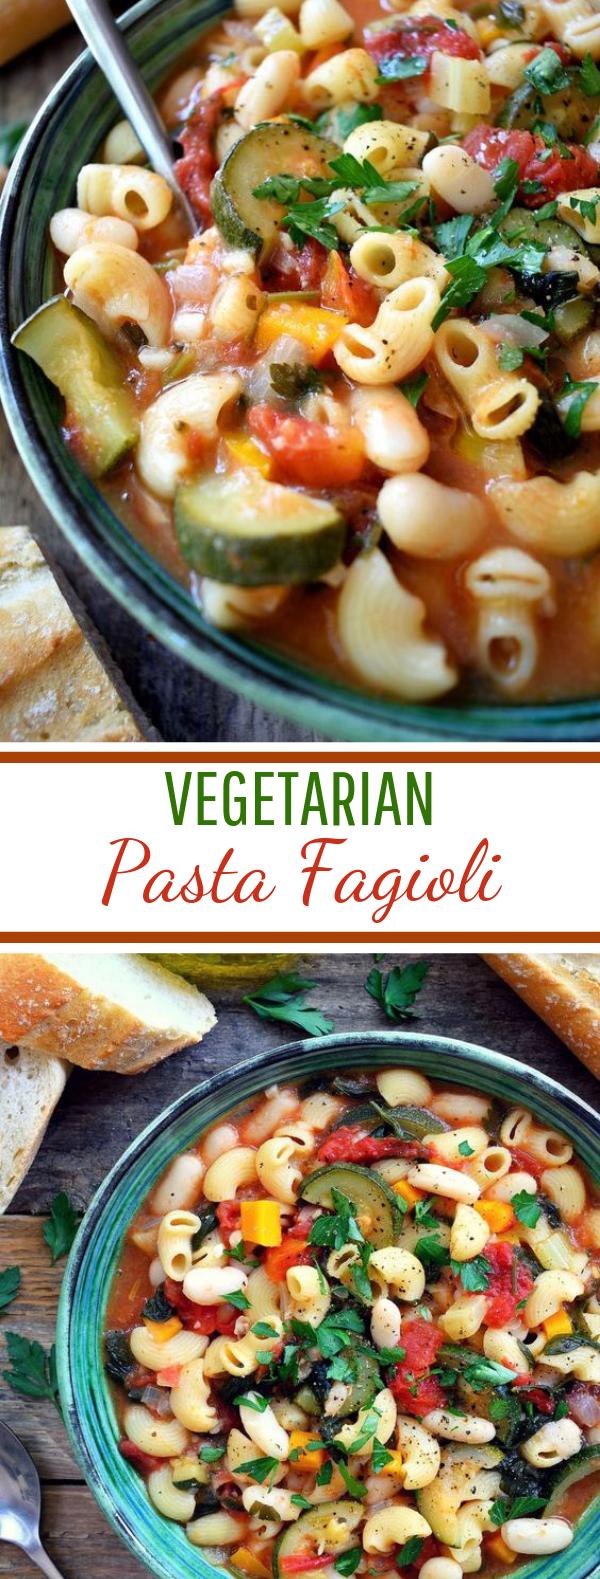 Vegetarian Pasta Fagioli #vegan #pasta